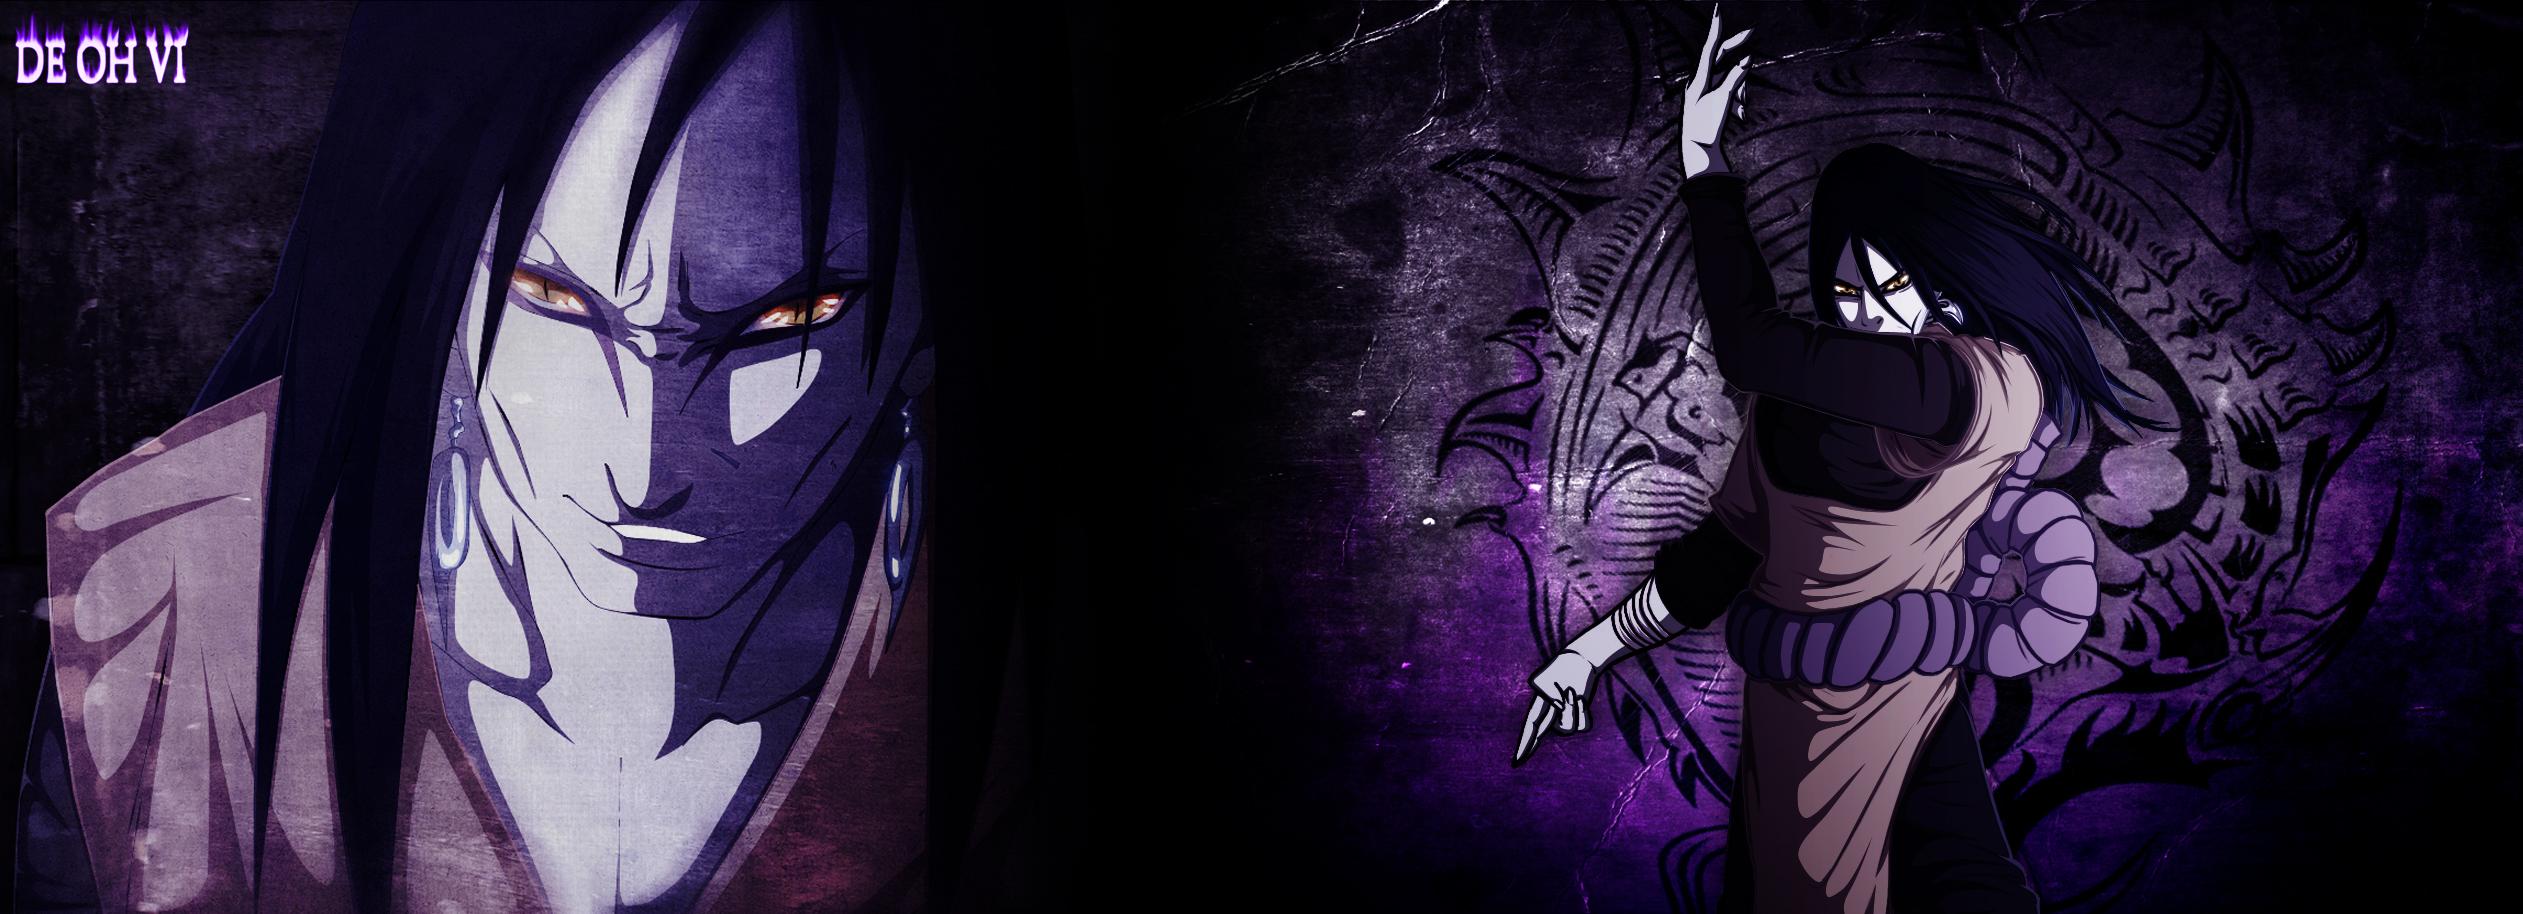 wallpaper hd sasuke